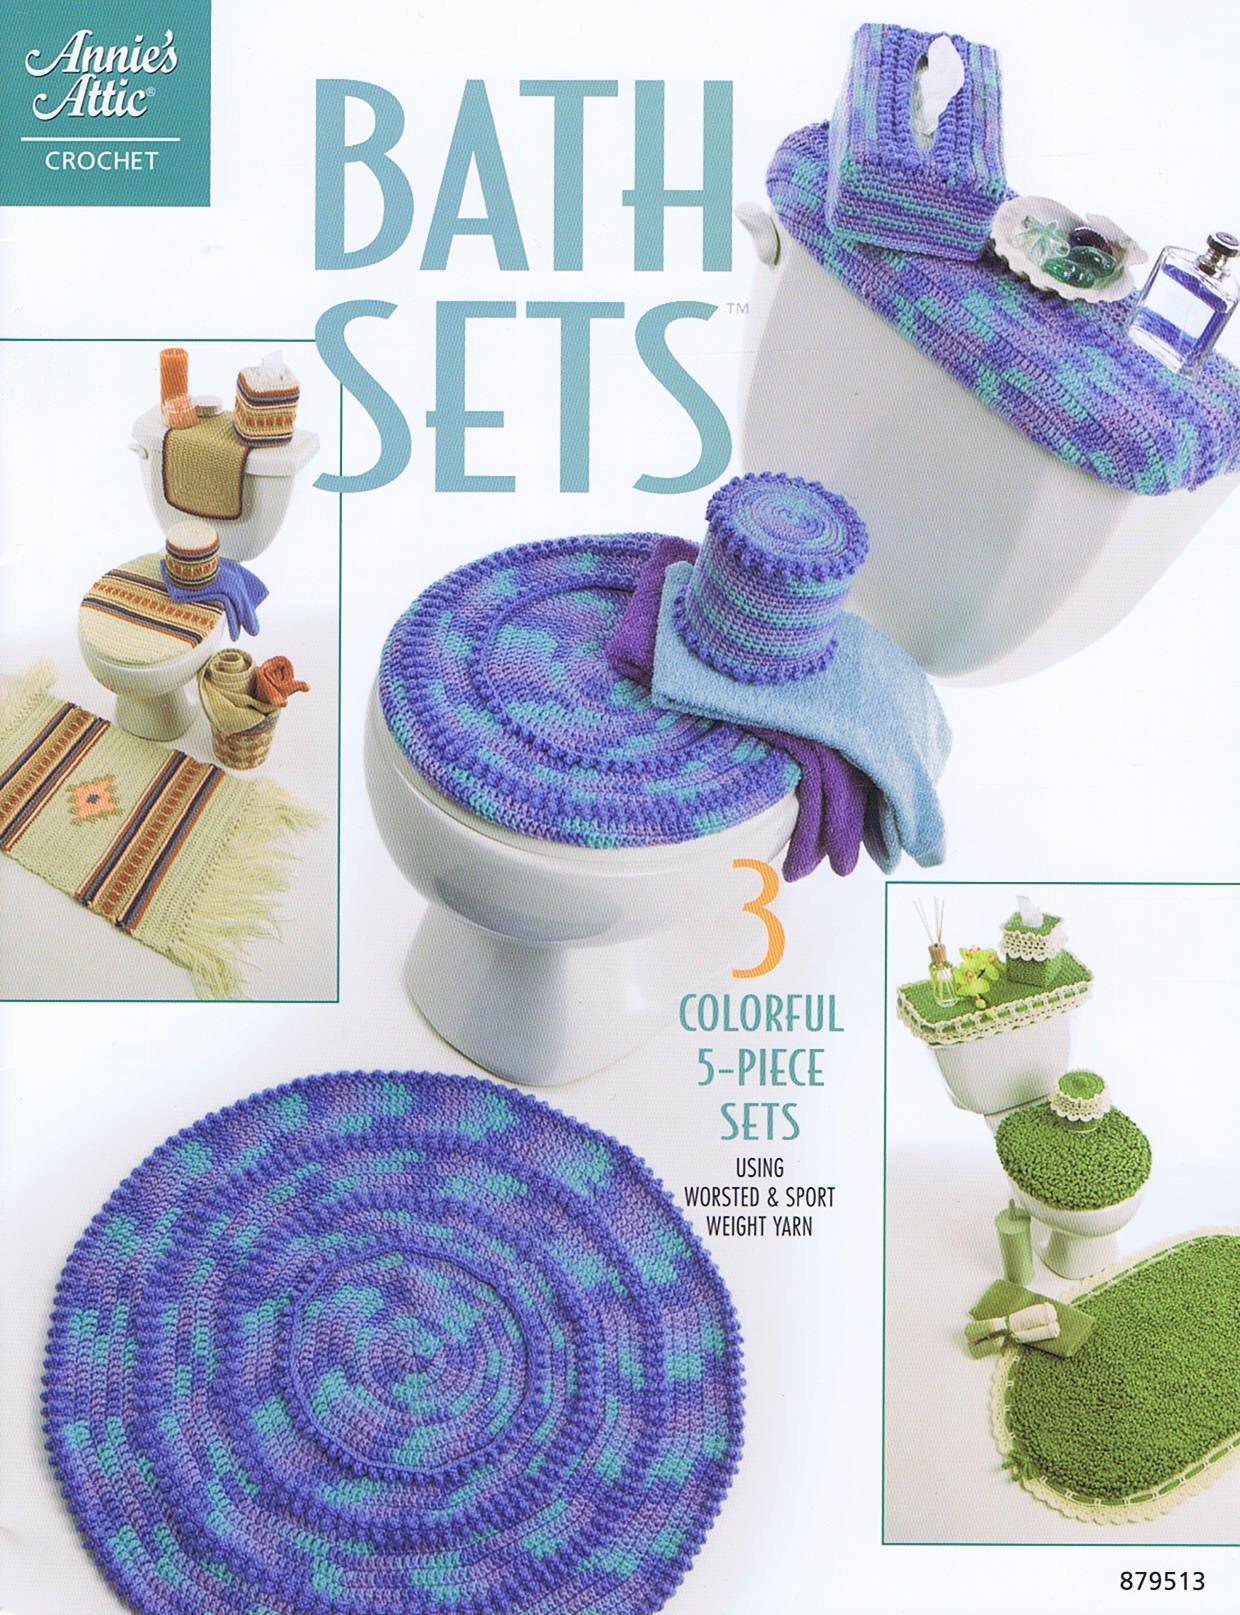 Download Annie's Attic Crochett Bath Sets - 3 Colorful 5-Piece Sets ebook